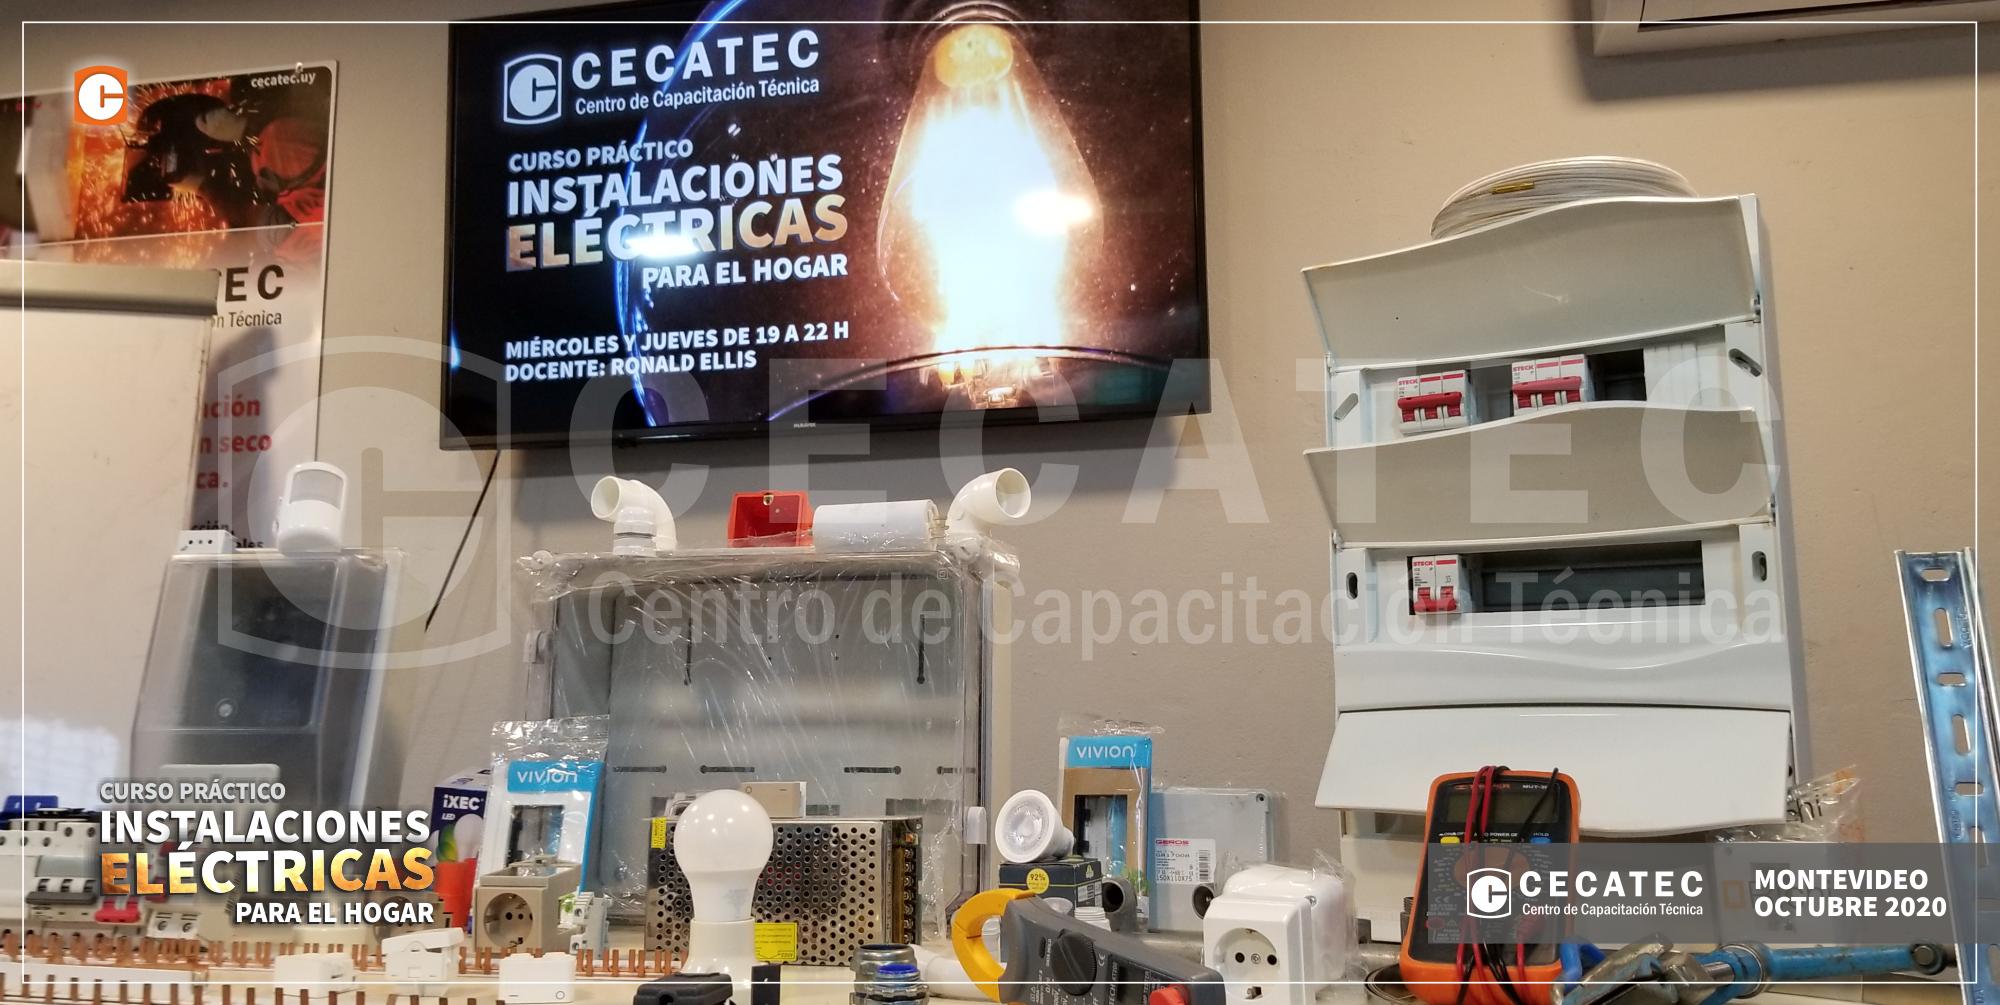 Electrica-2020-10-29-01